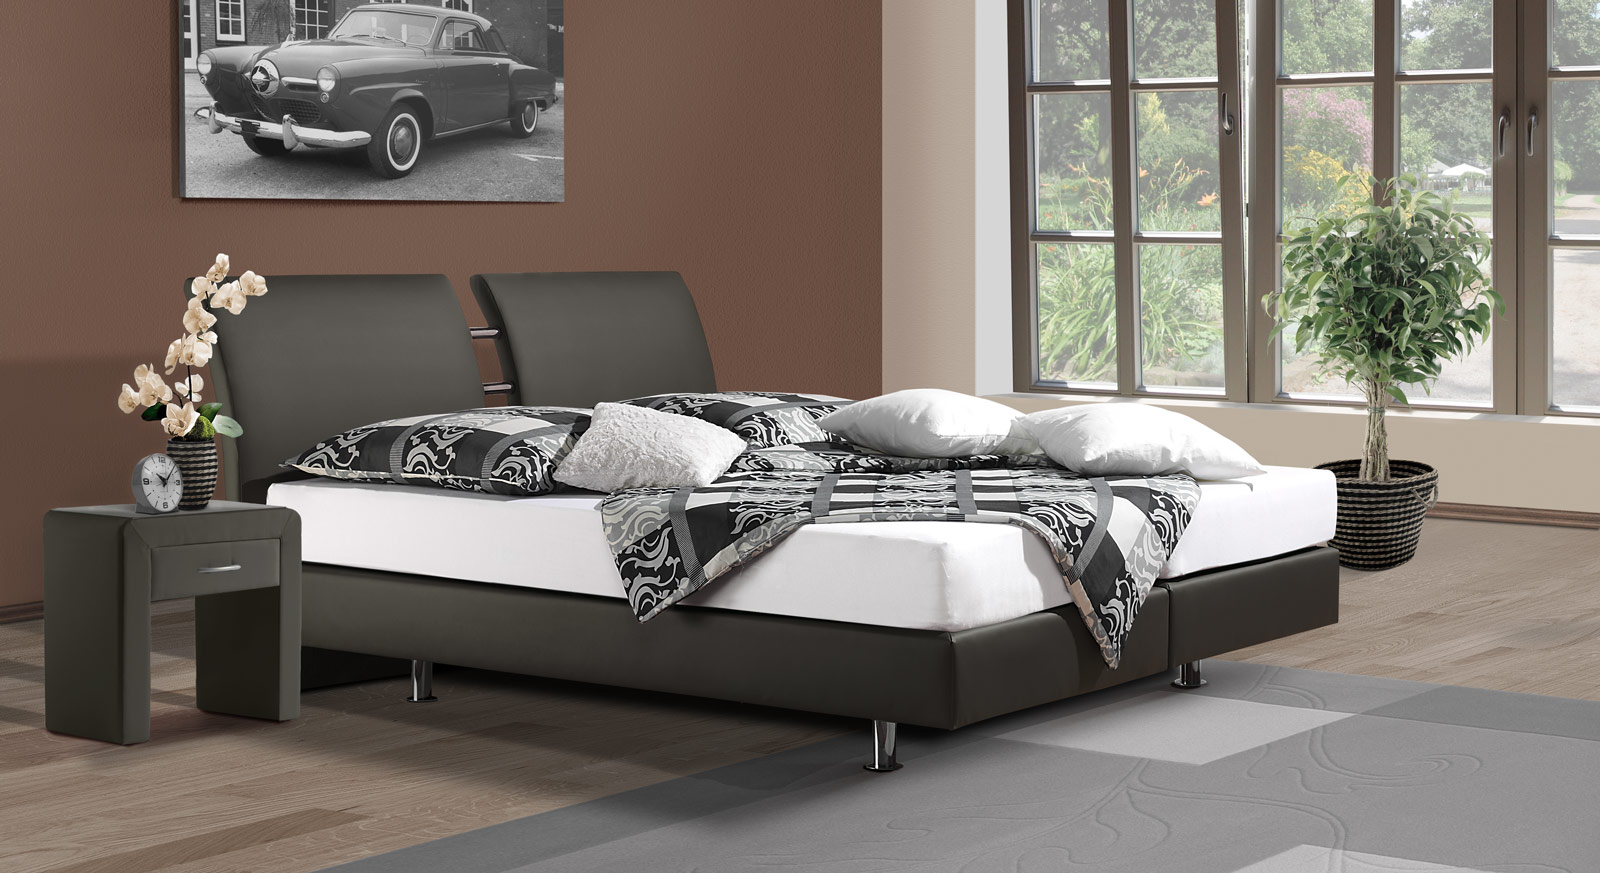 g nstiges boxspringbett aus kunstleder und chrom fernando. Black Bedroom Furniture Sets. Home Design Ideas